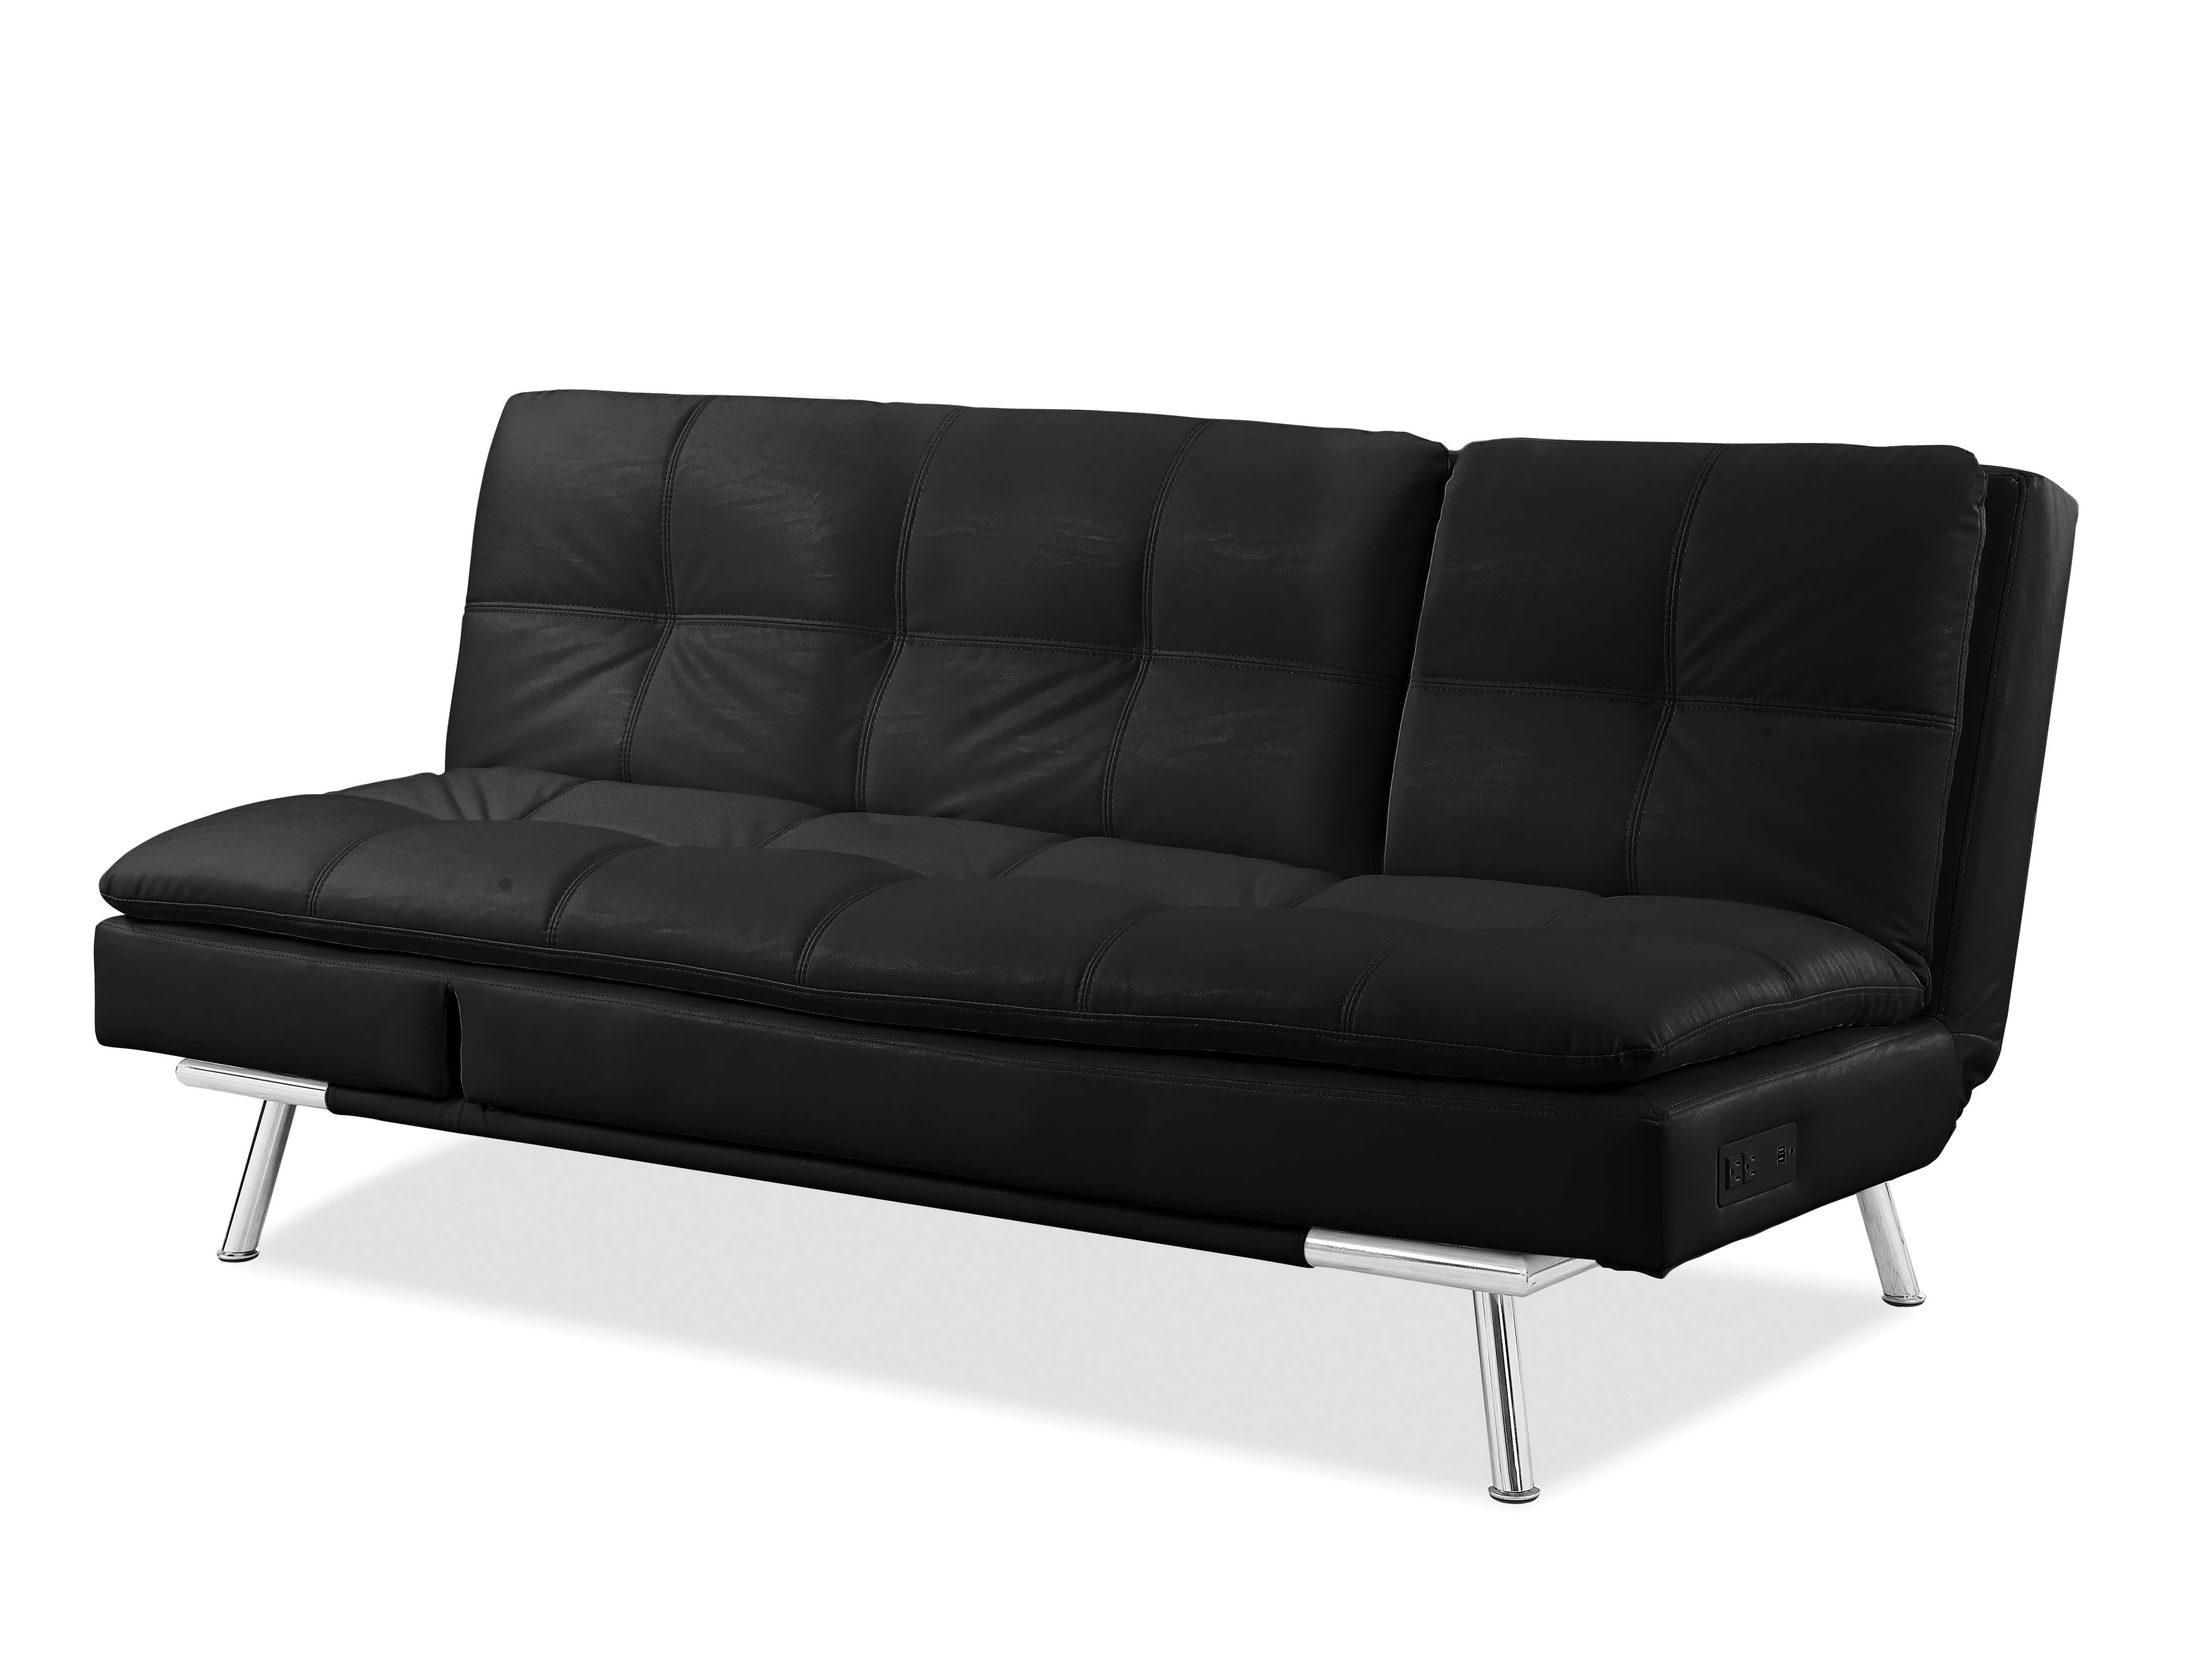 Palermo Convertible Sofa Black by Serta Lifestyle